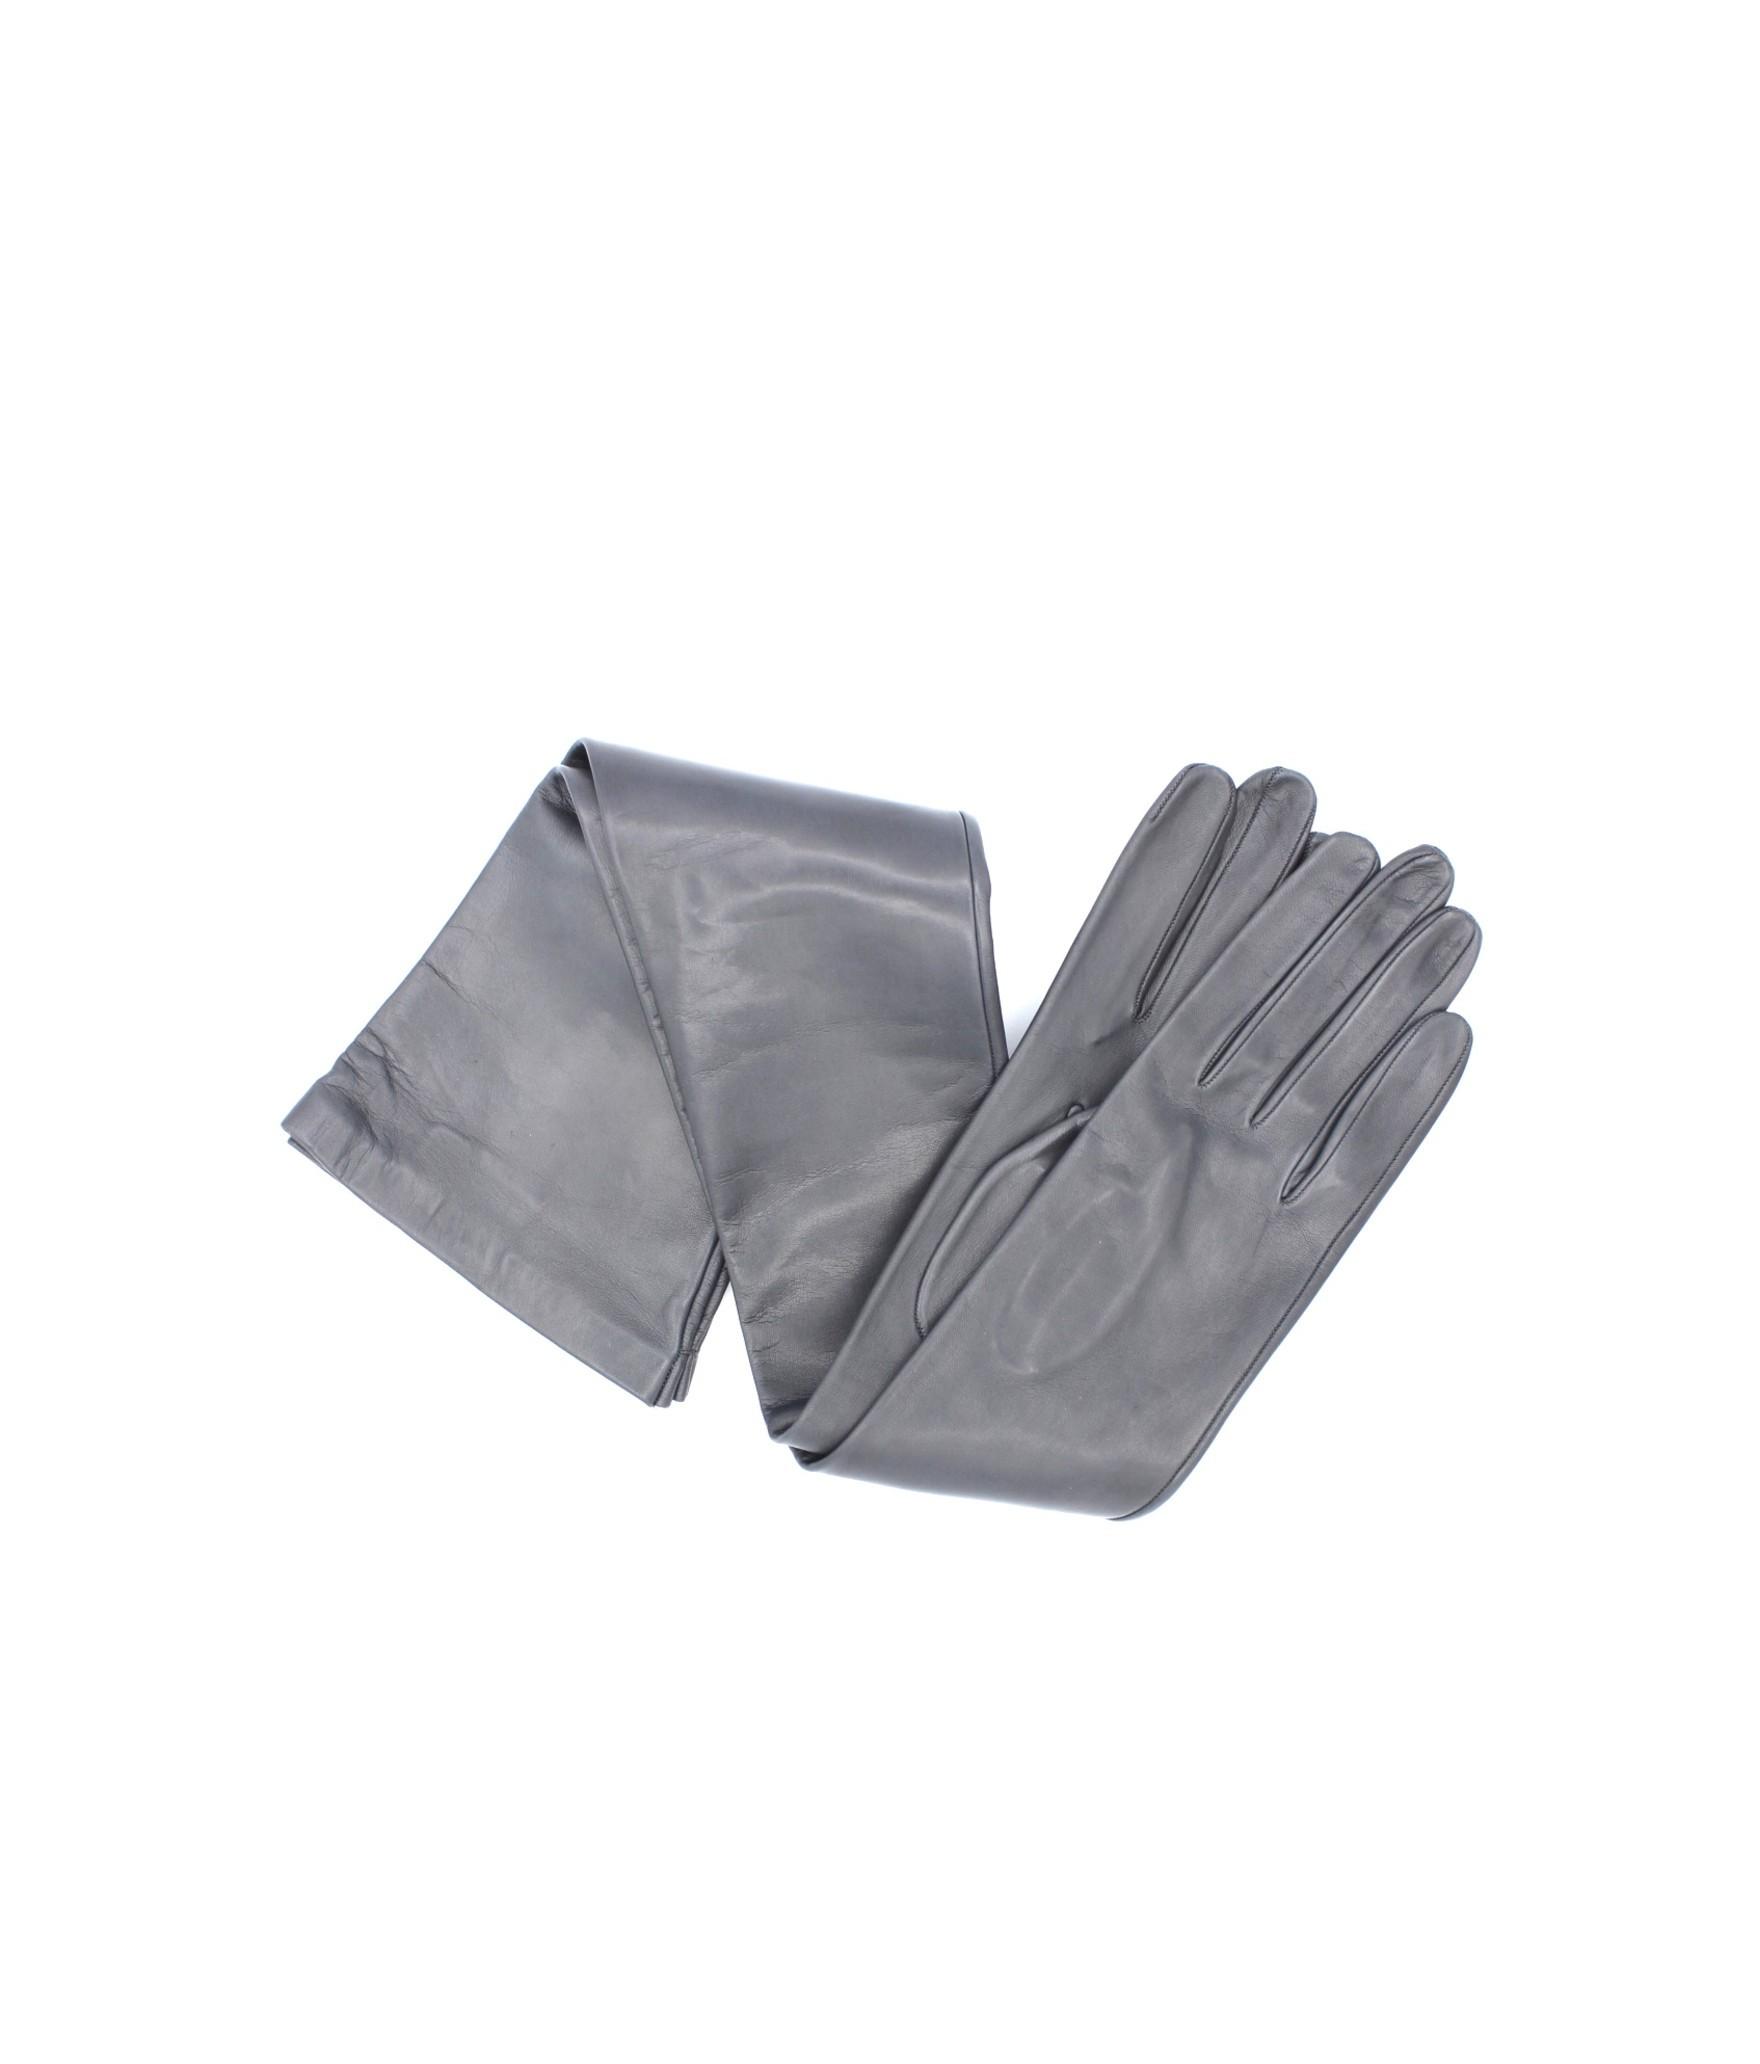 Nappa leather gloves 16bt silk lined Dark Grey Sermoneta Gloves